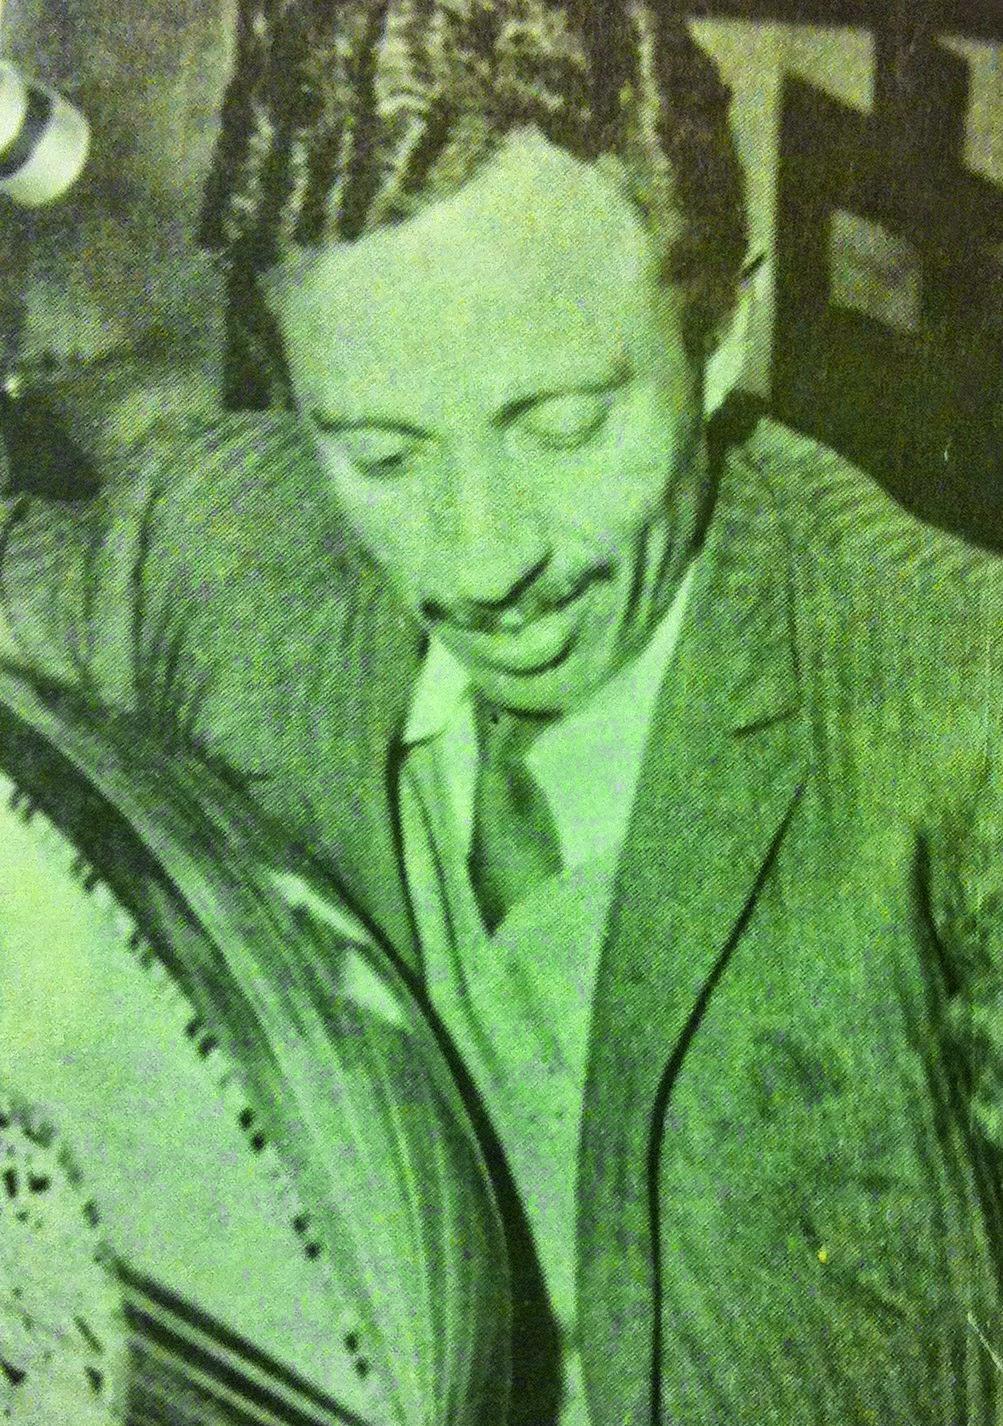 اغاني محمد سعد عبدالله القديمه